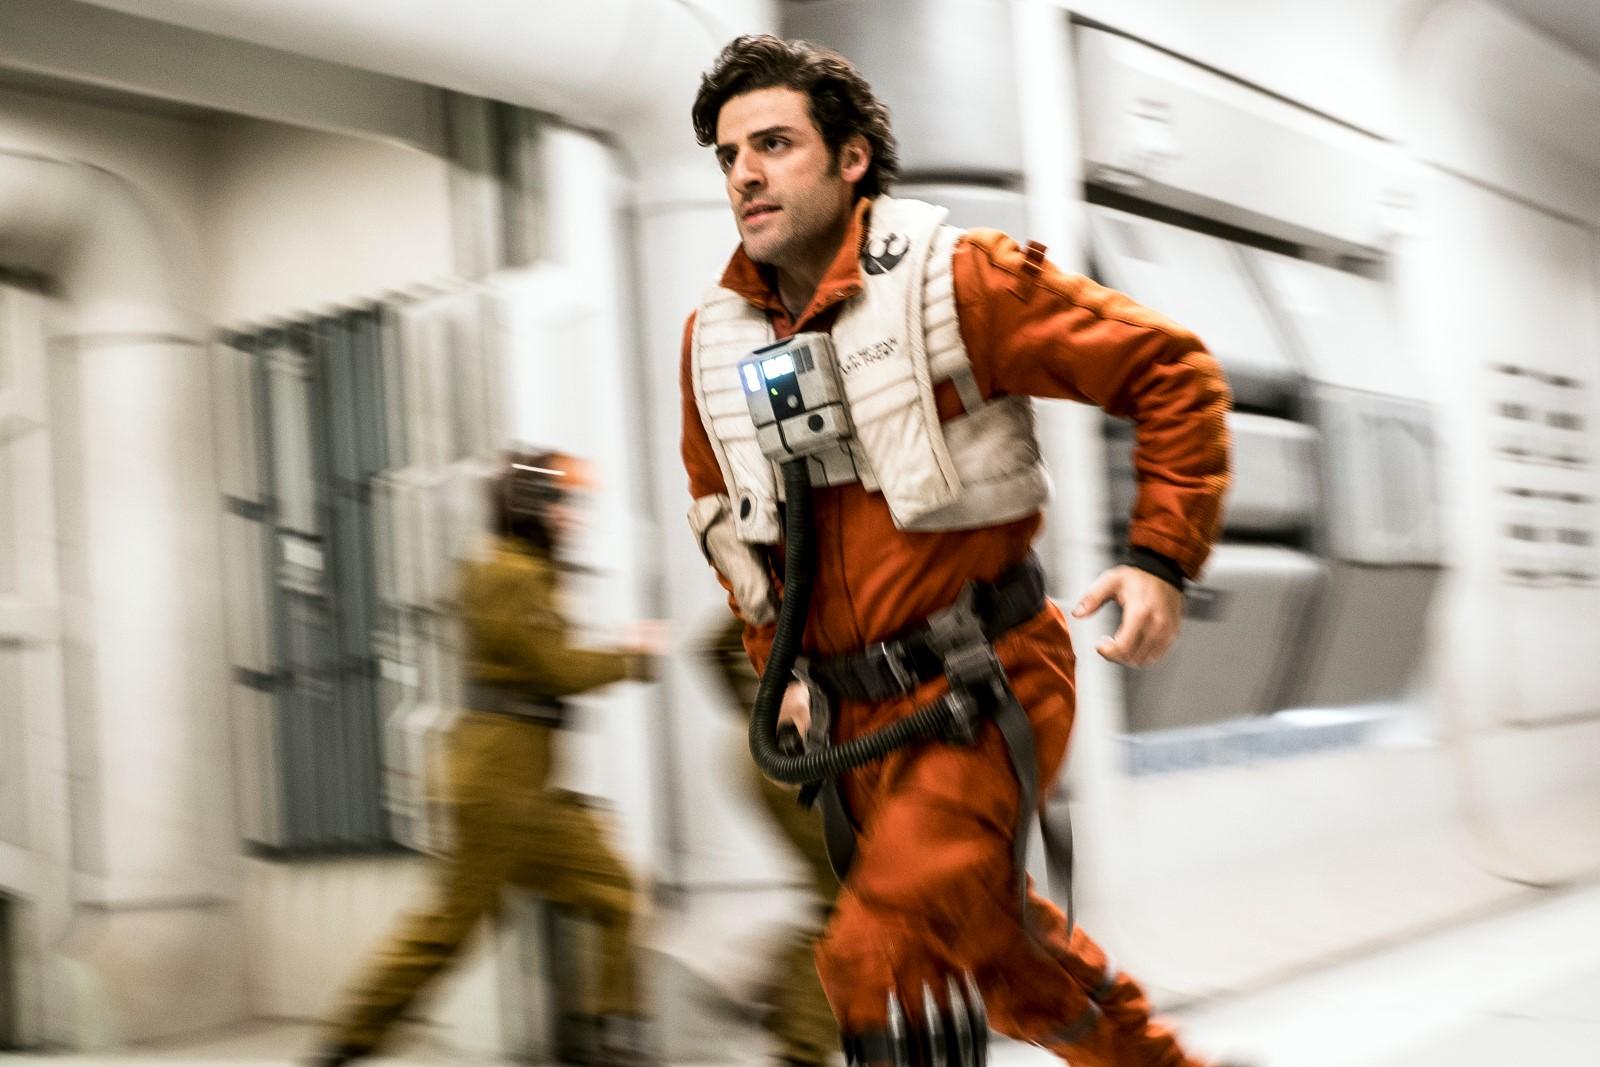 Poe Dameron (Oscar Isaac) Crédit photo : David James ©2017 Lucasfilm Ltd